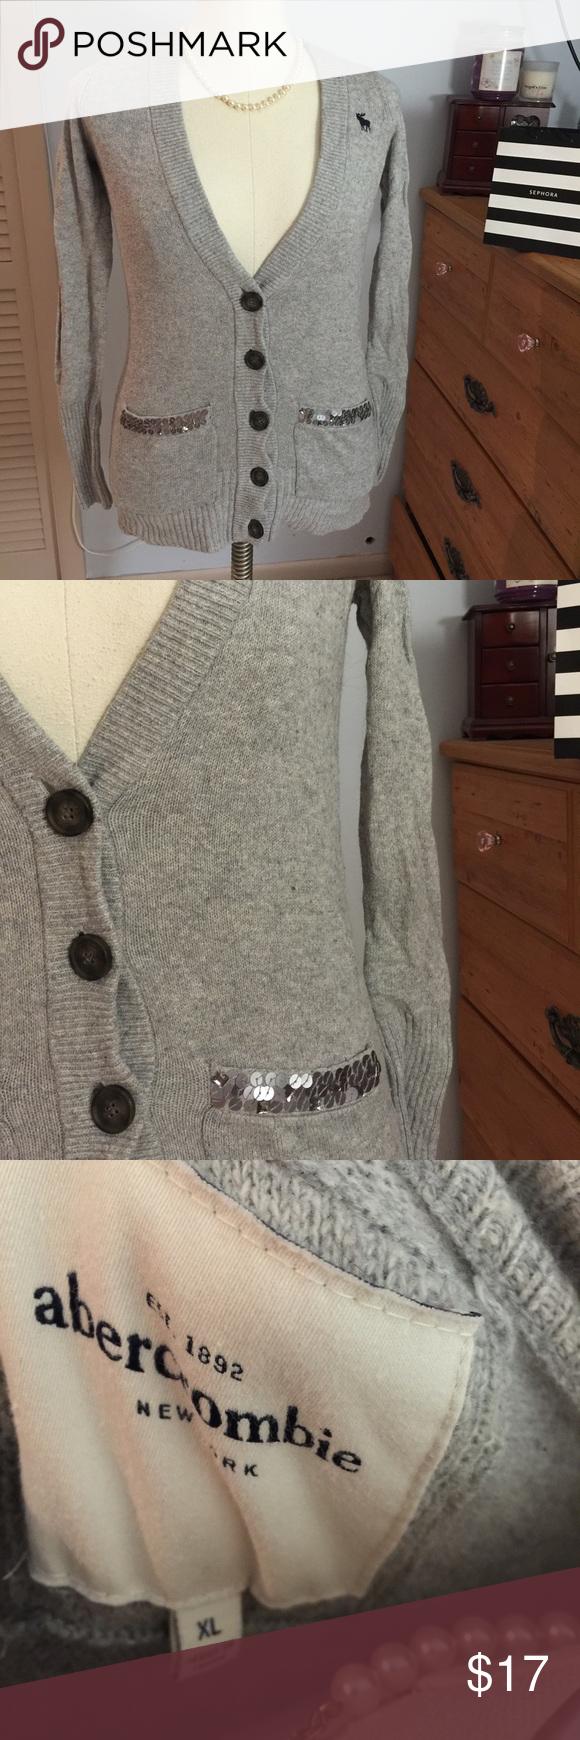 💜Abercrombie sequin cardigan💜 Beautiful cardigan with shiny ...